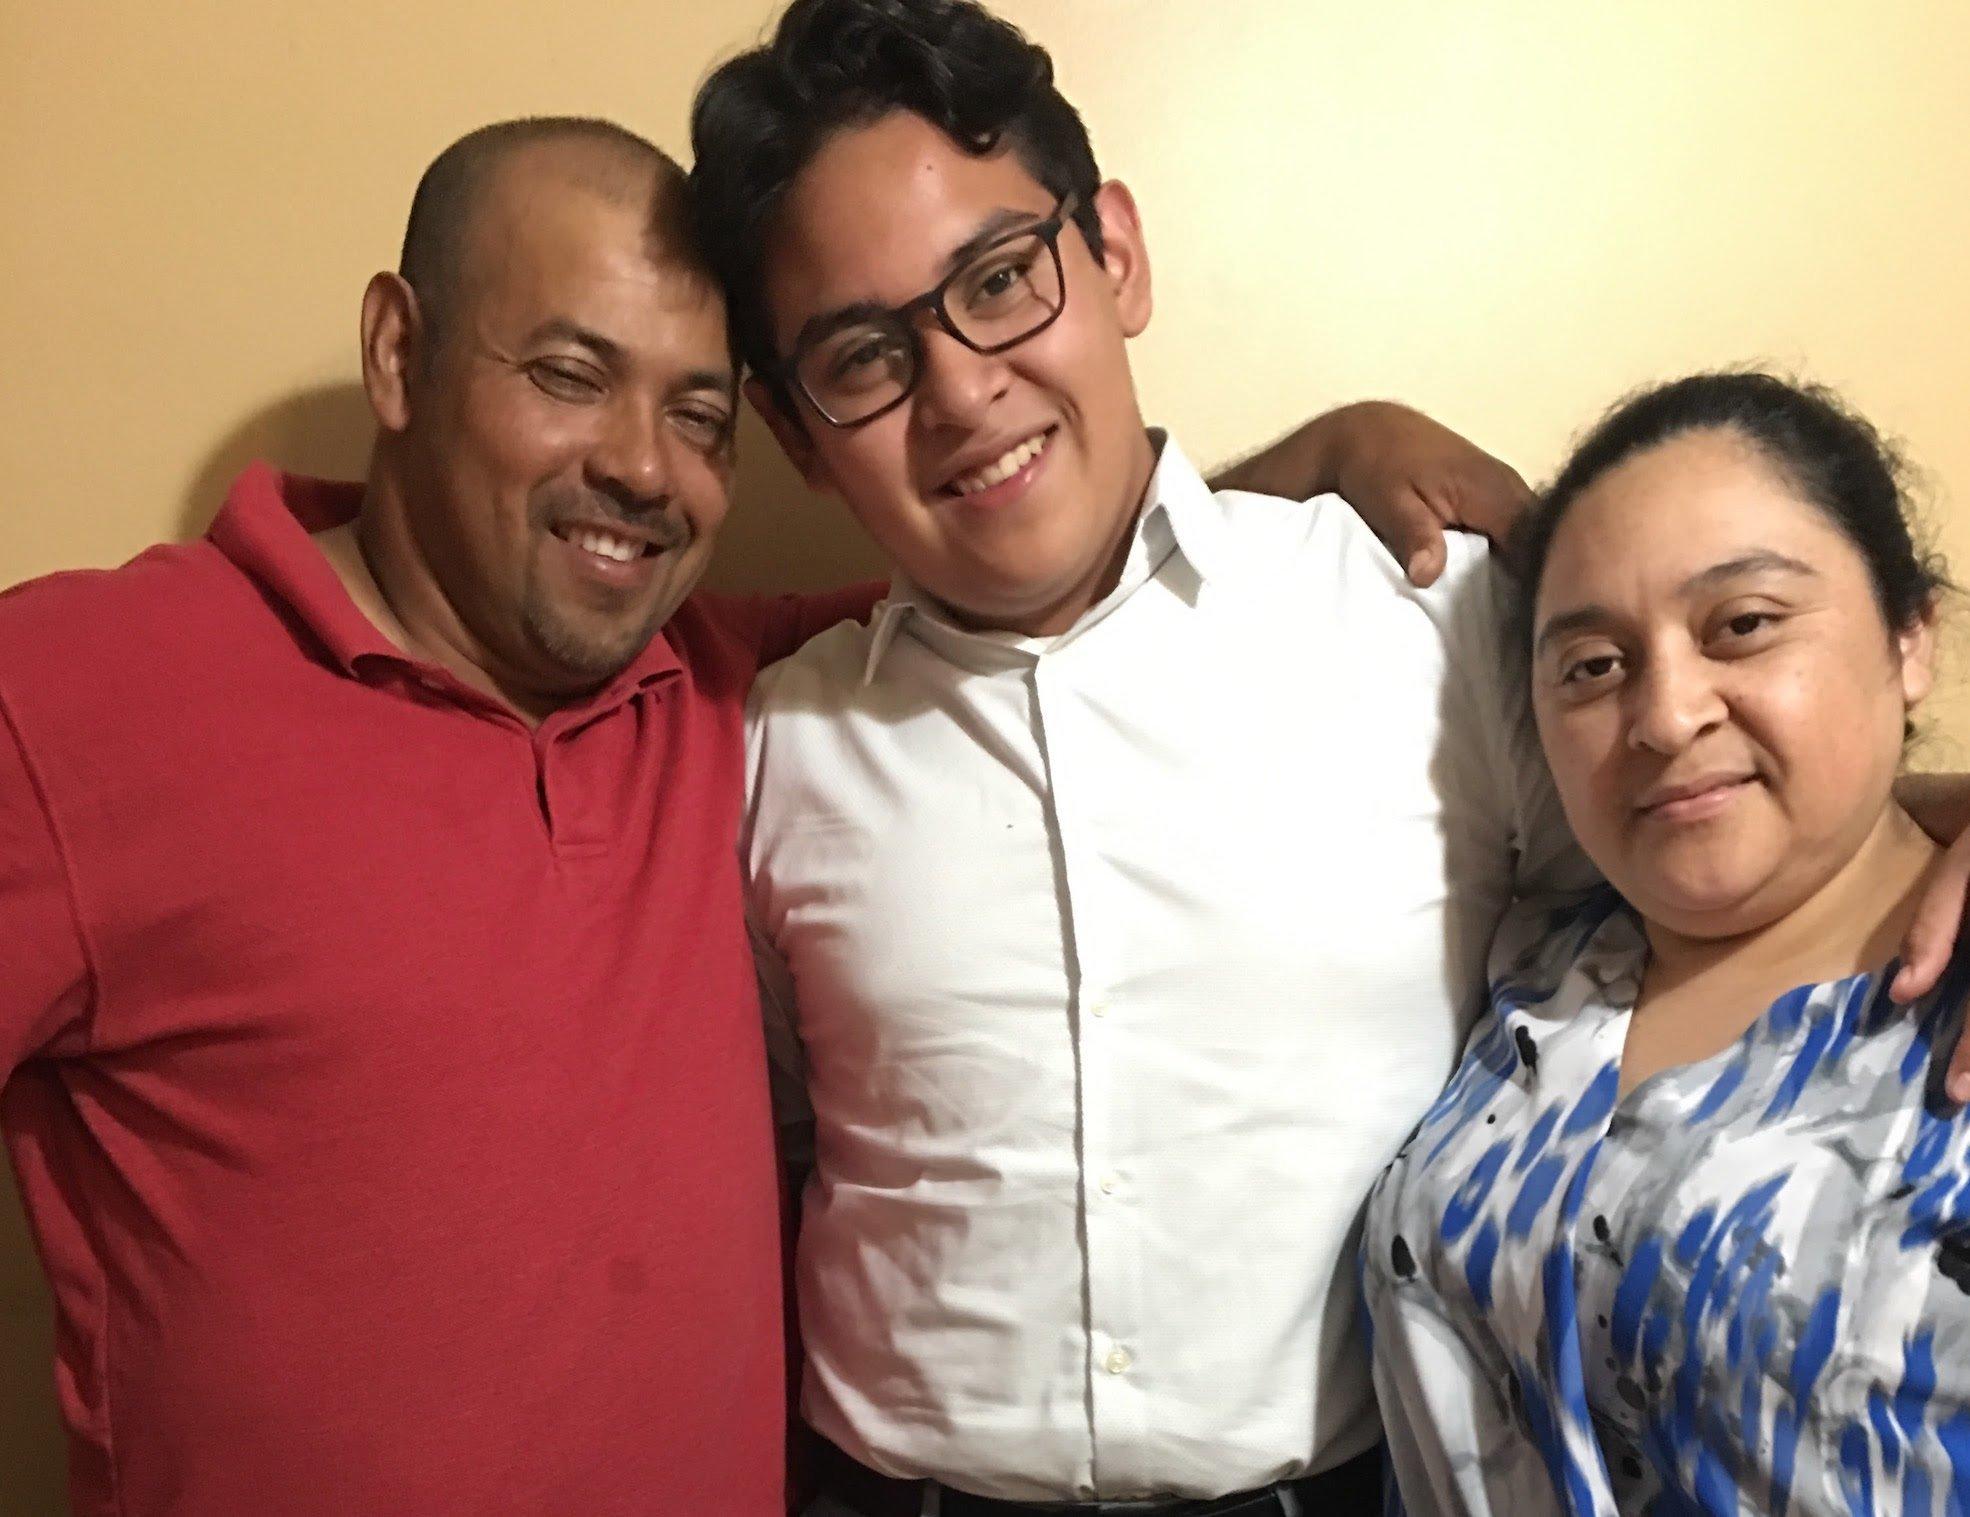 Samuel Amaya; his older son, Sam Amaya; and his wife, Idalia Majano-Amaya, are all living in the U.S. under temporary protect